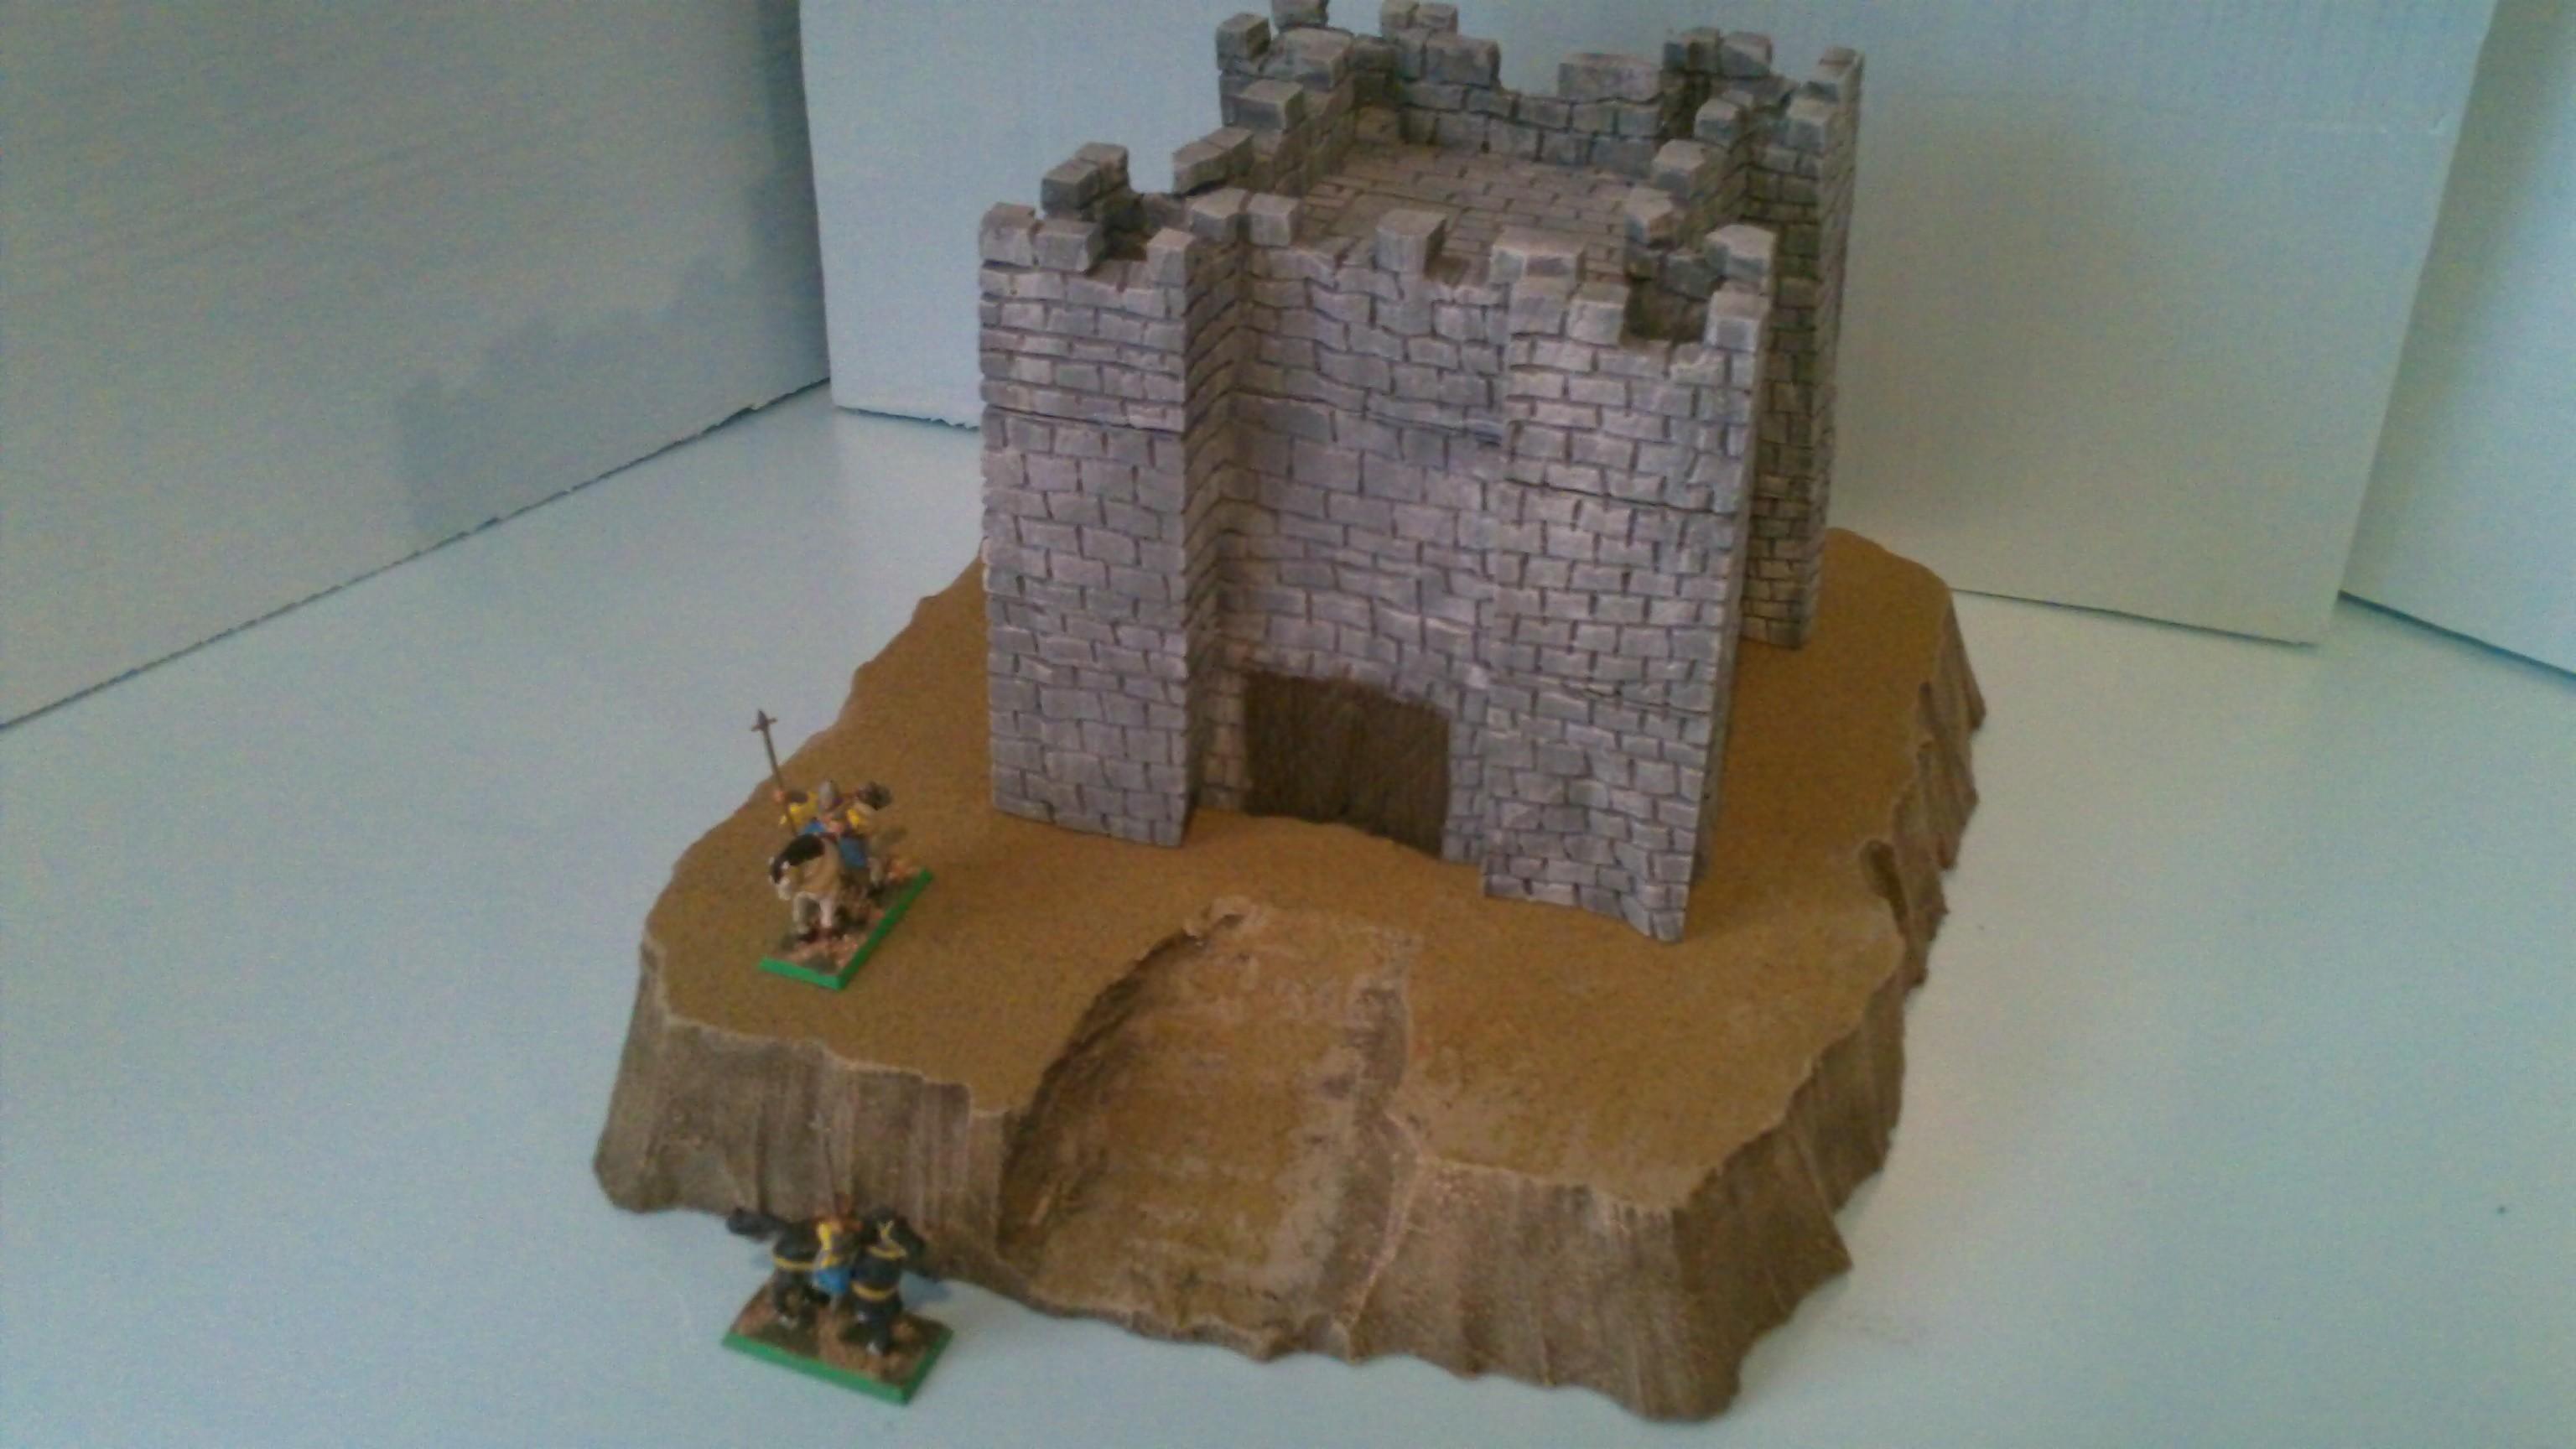 Wargame Terrain castle image Hazeknight.com